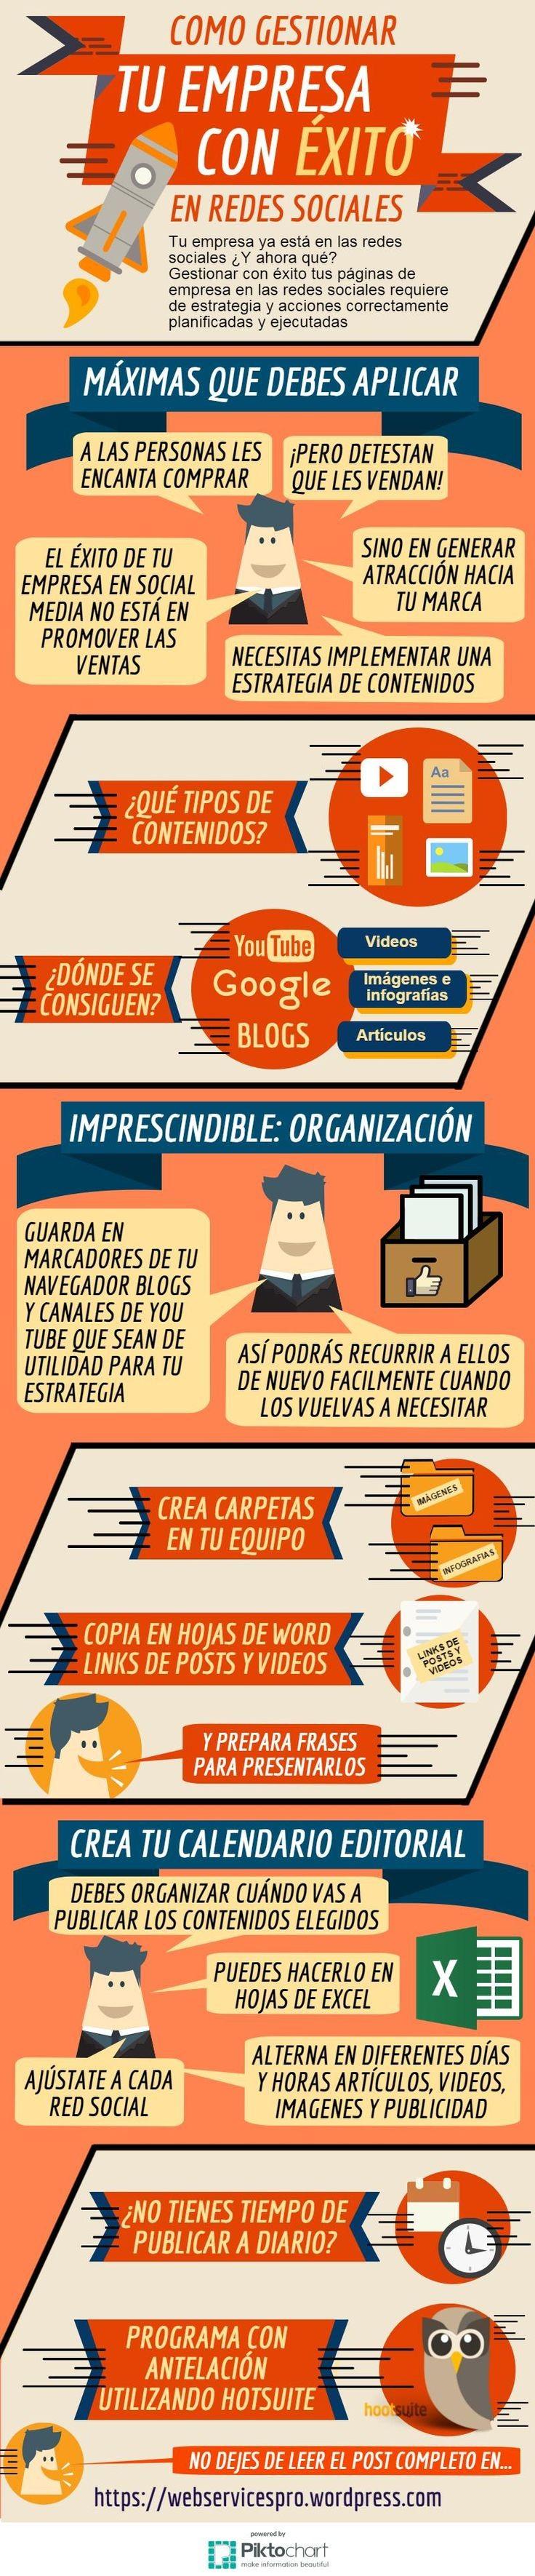 Calendario 2019 Tumblr Más Caliente 264 Best Infografas Images On Pinterest Of Calendario 2019 Tumblr Más Caliente 38 Best Business Images On Pinterest